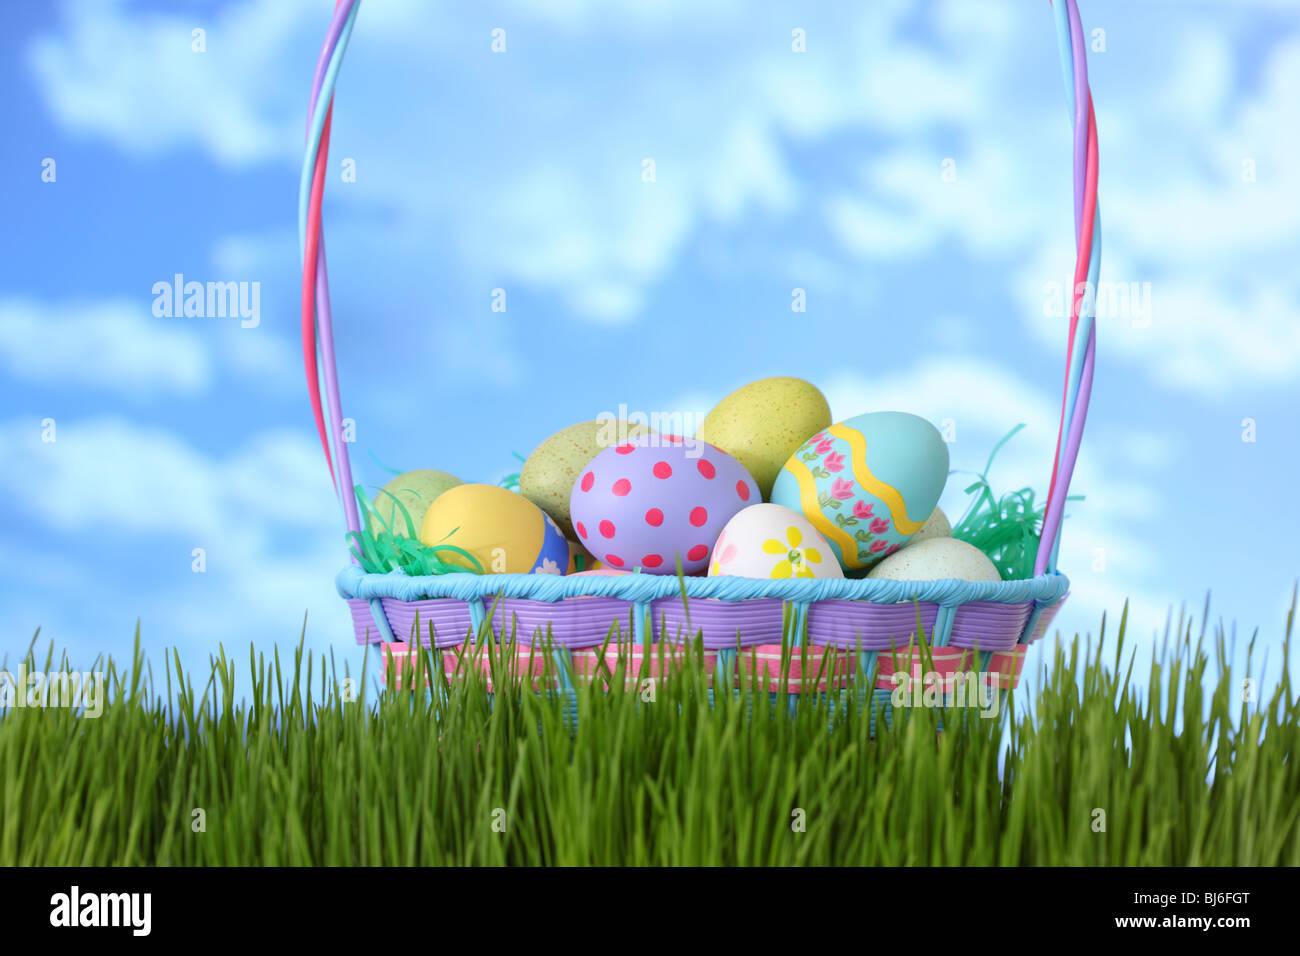 Panier de Pâques dans l'herbe avec ciel bleu Photo Stock